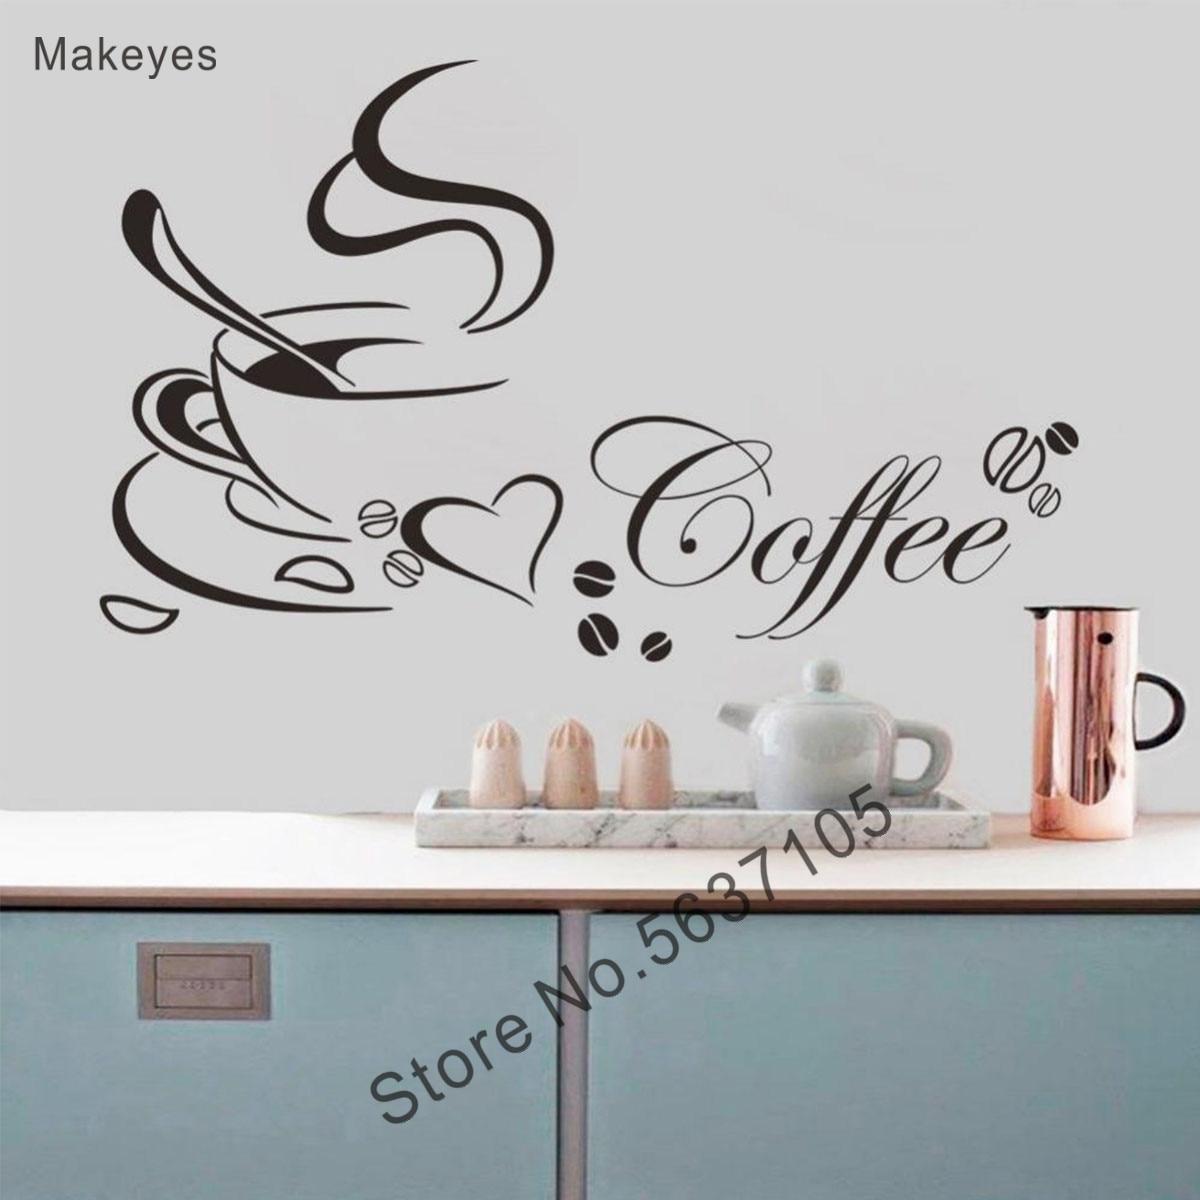 Makeyes café etiqueta de la pared de decoración de pared de cocina casa cálida decoración vinilo calcomanías de diseño para pared taza de café de papel Q037